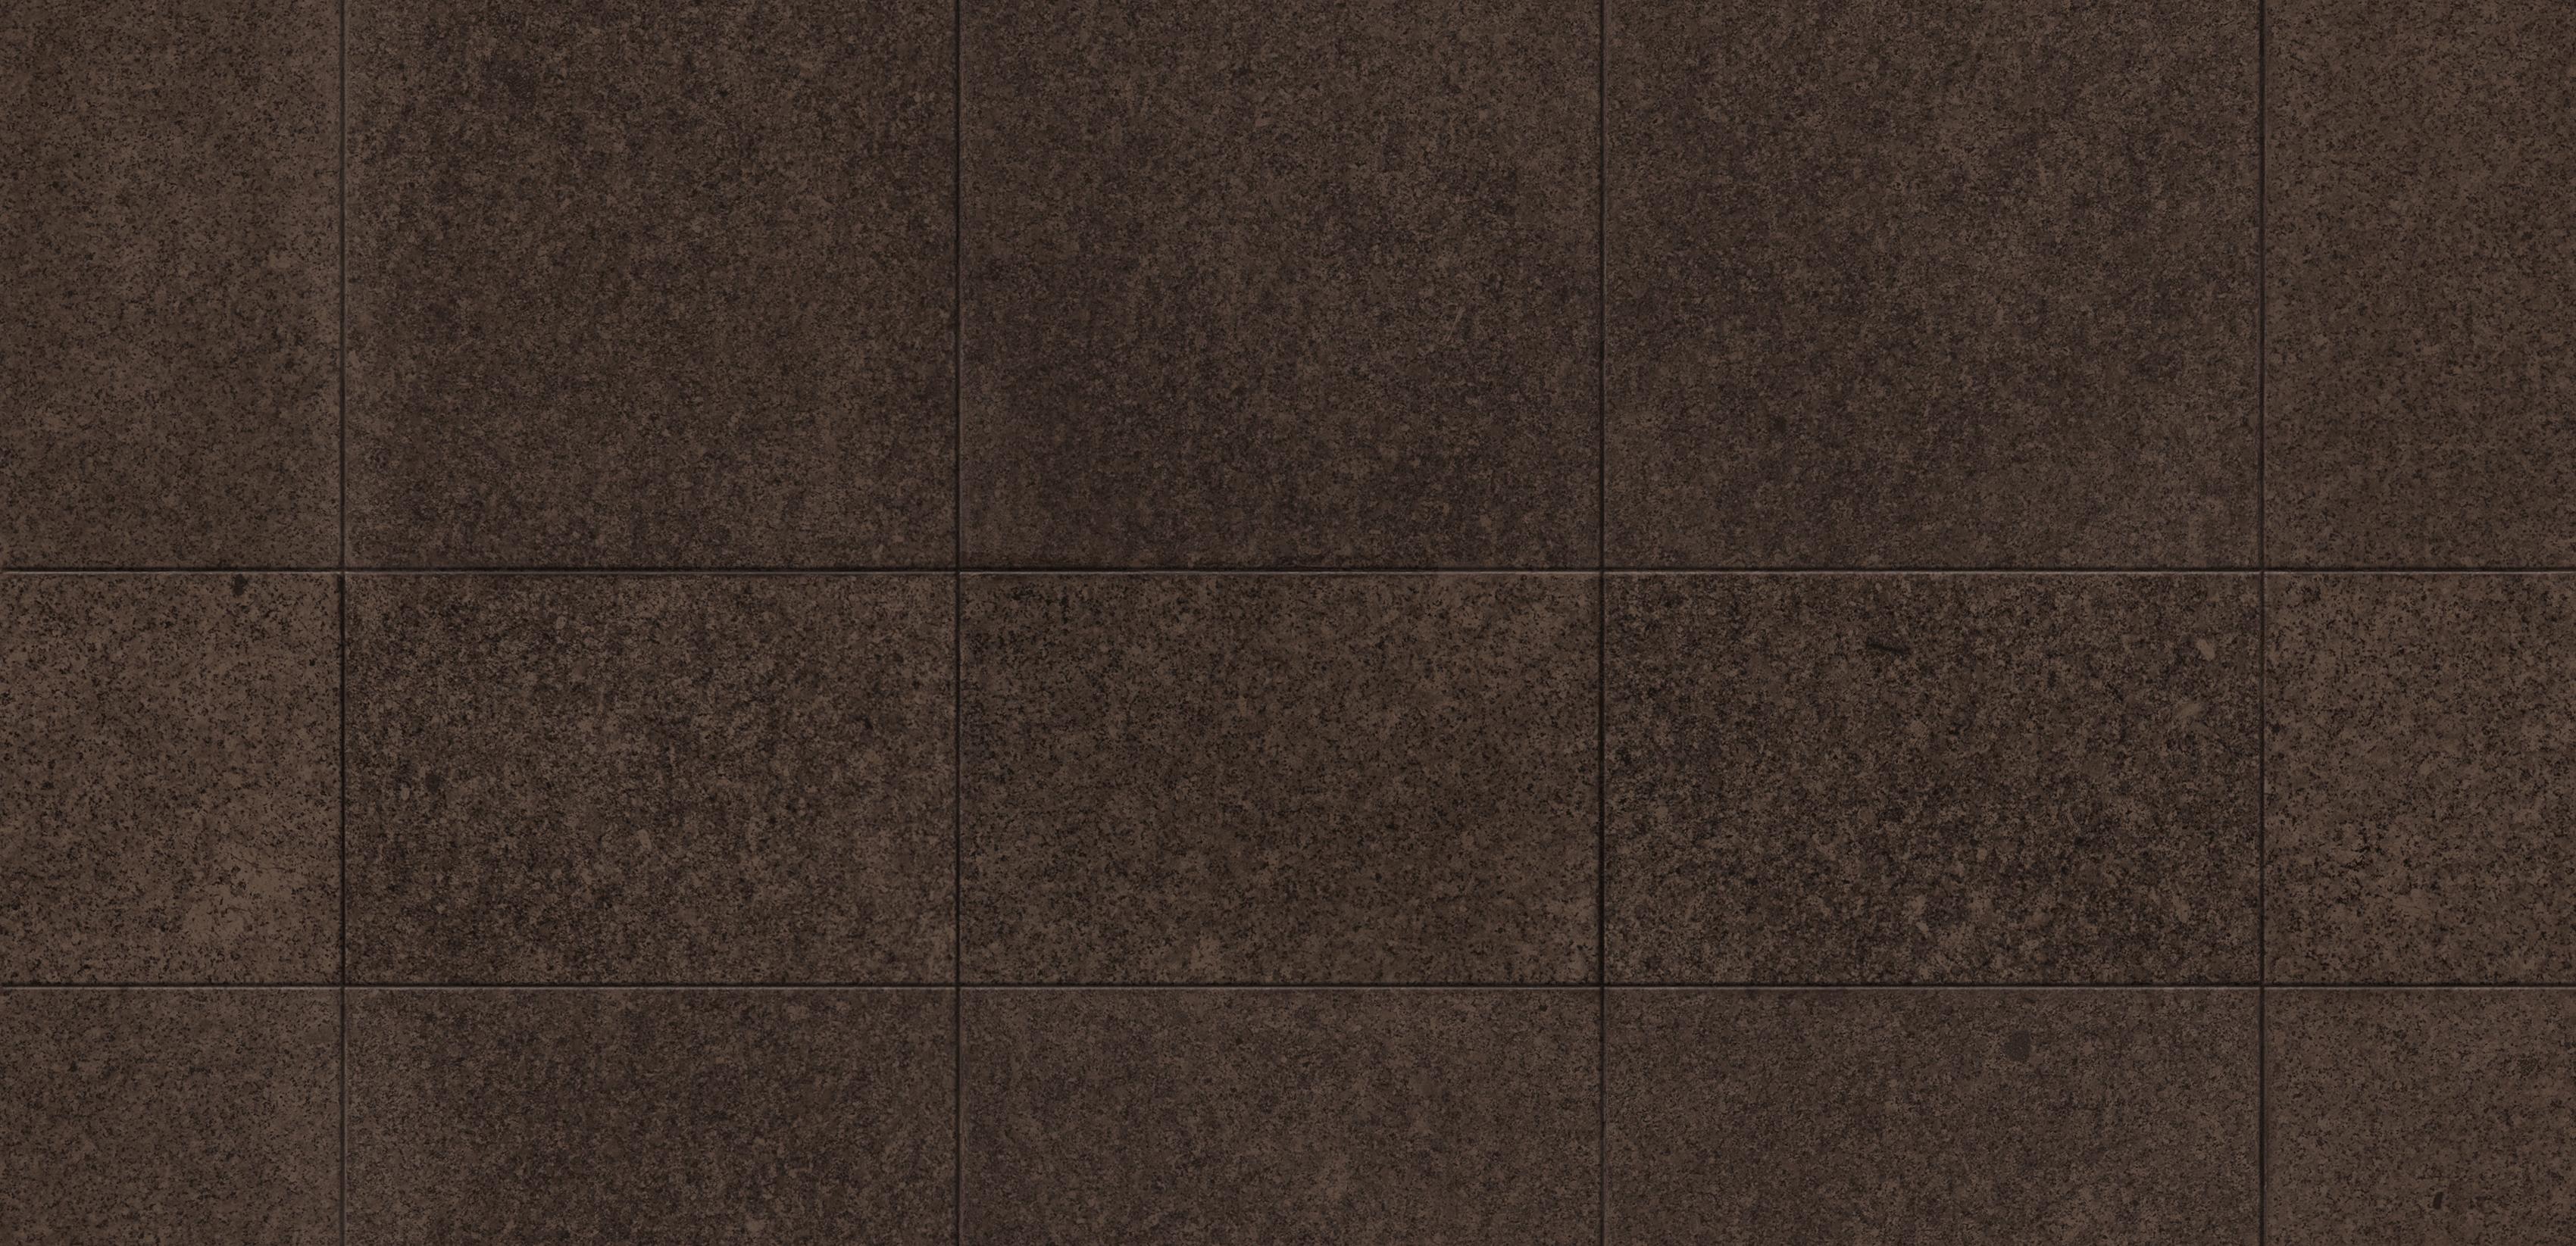 Large Dark Marble Tiles Seamless Texture Wild Textures